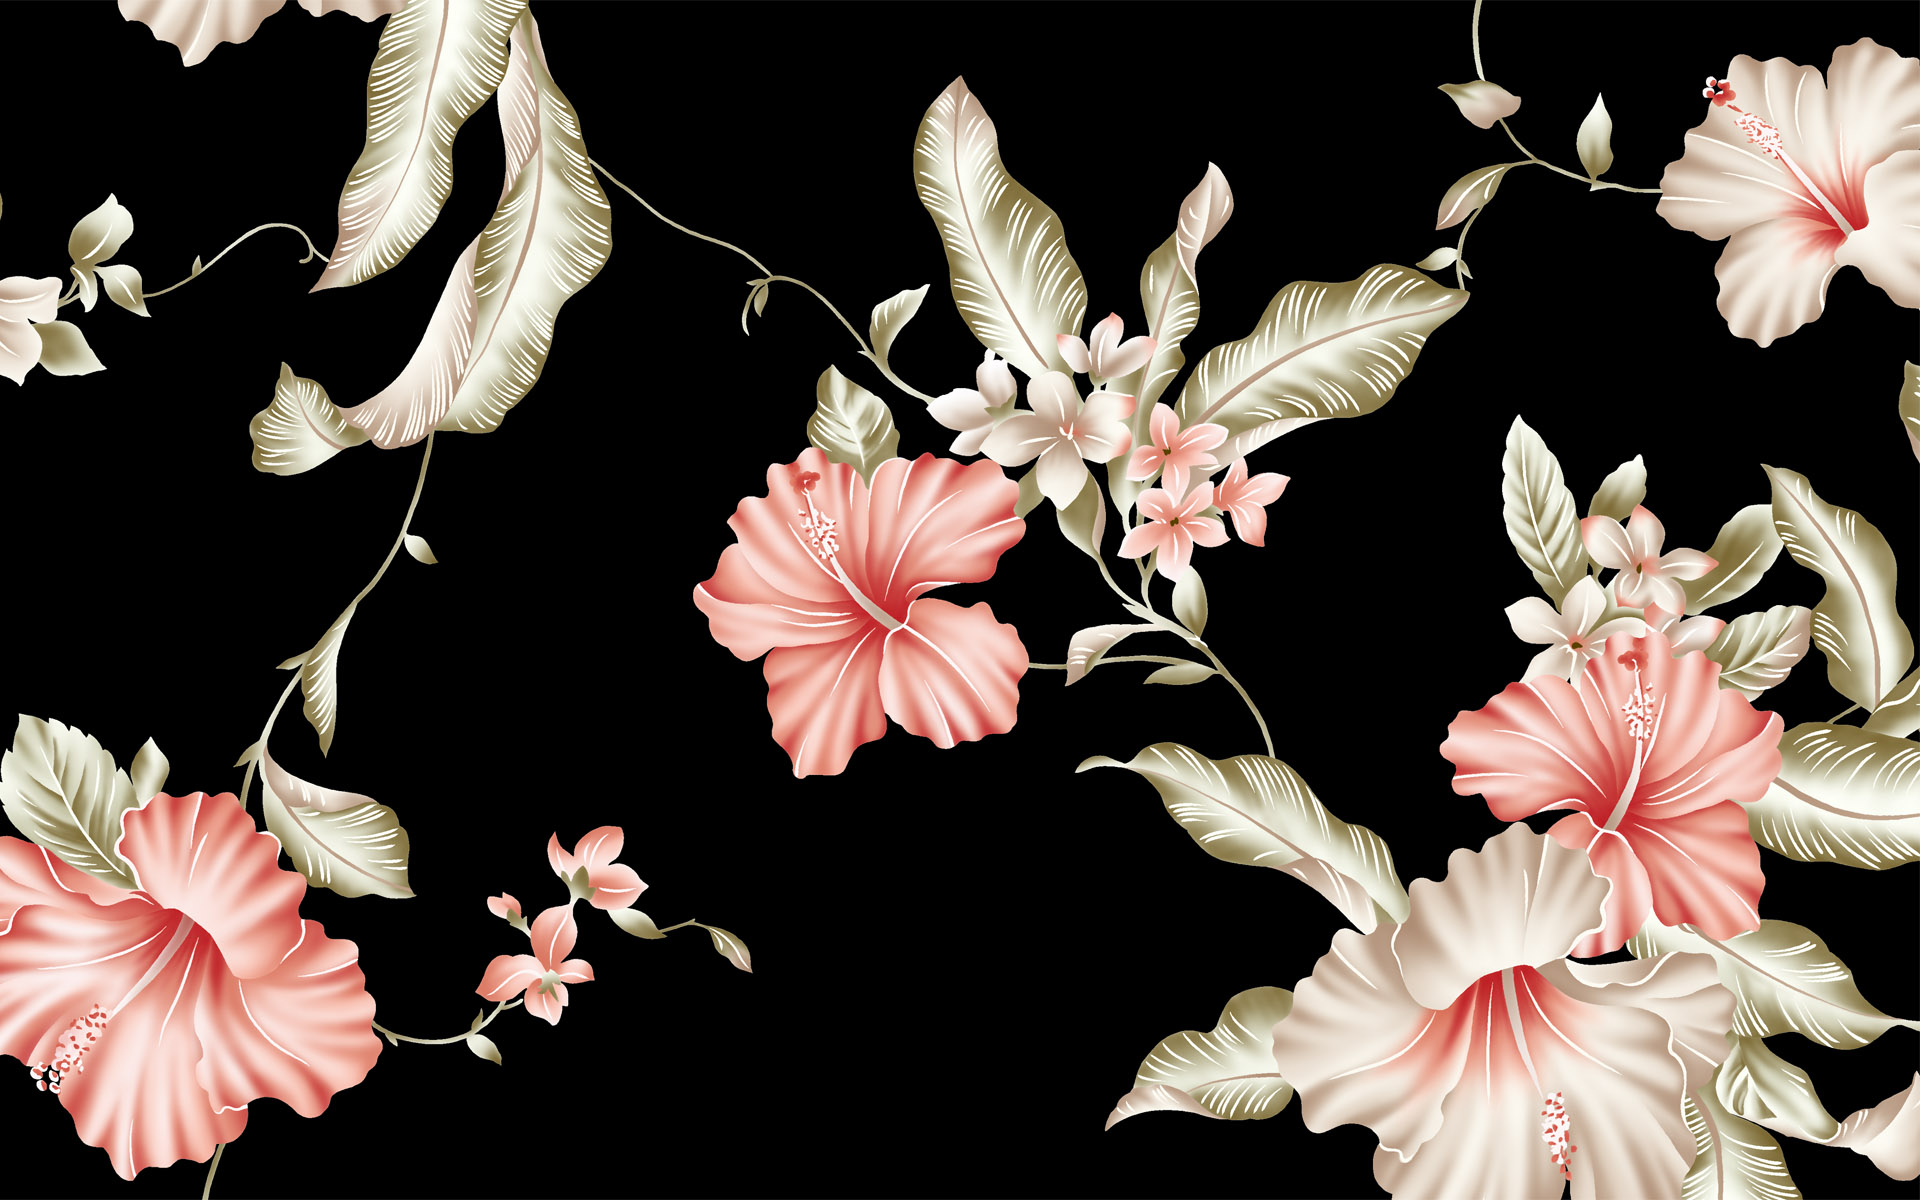 74 Floral Desktop Backgrounds On Wallpapersafari